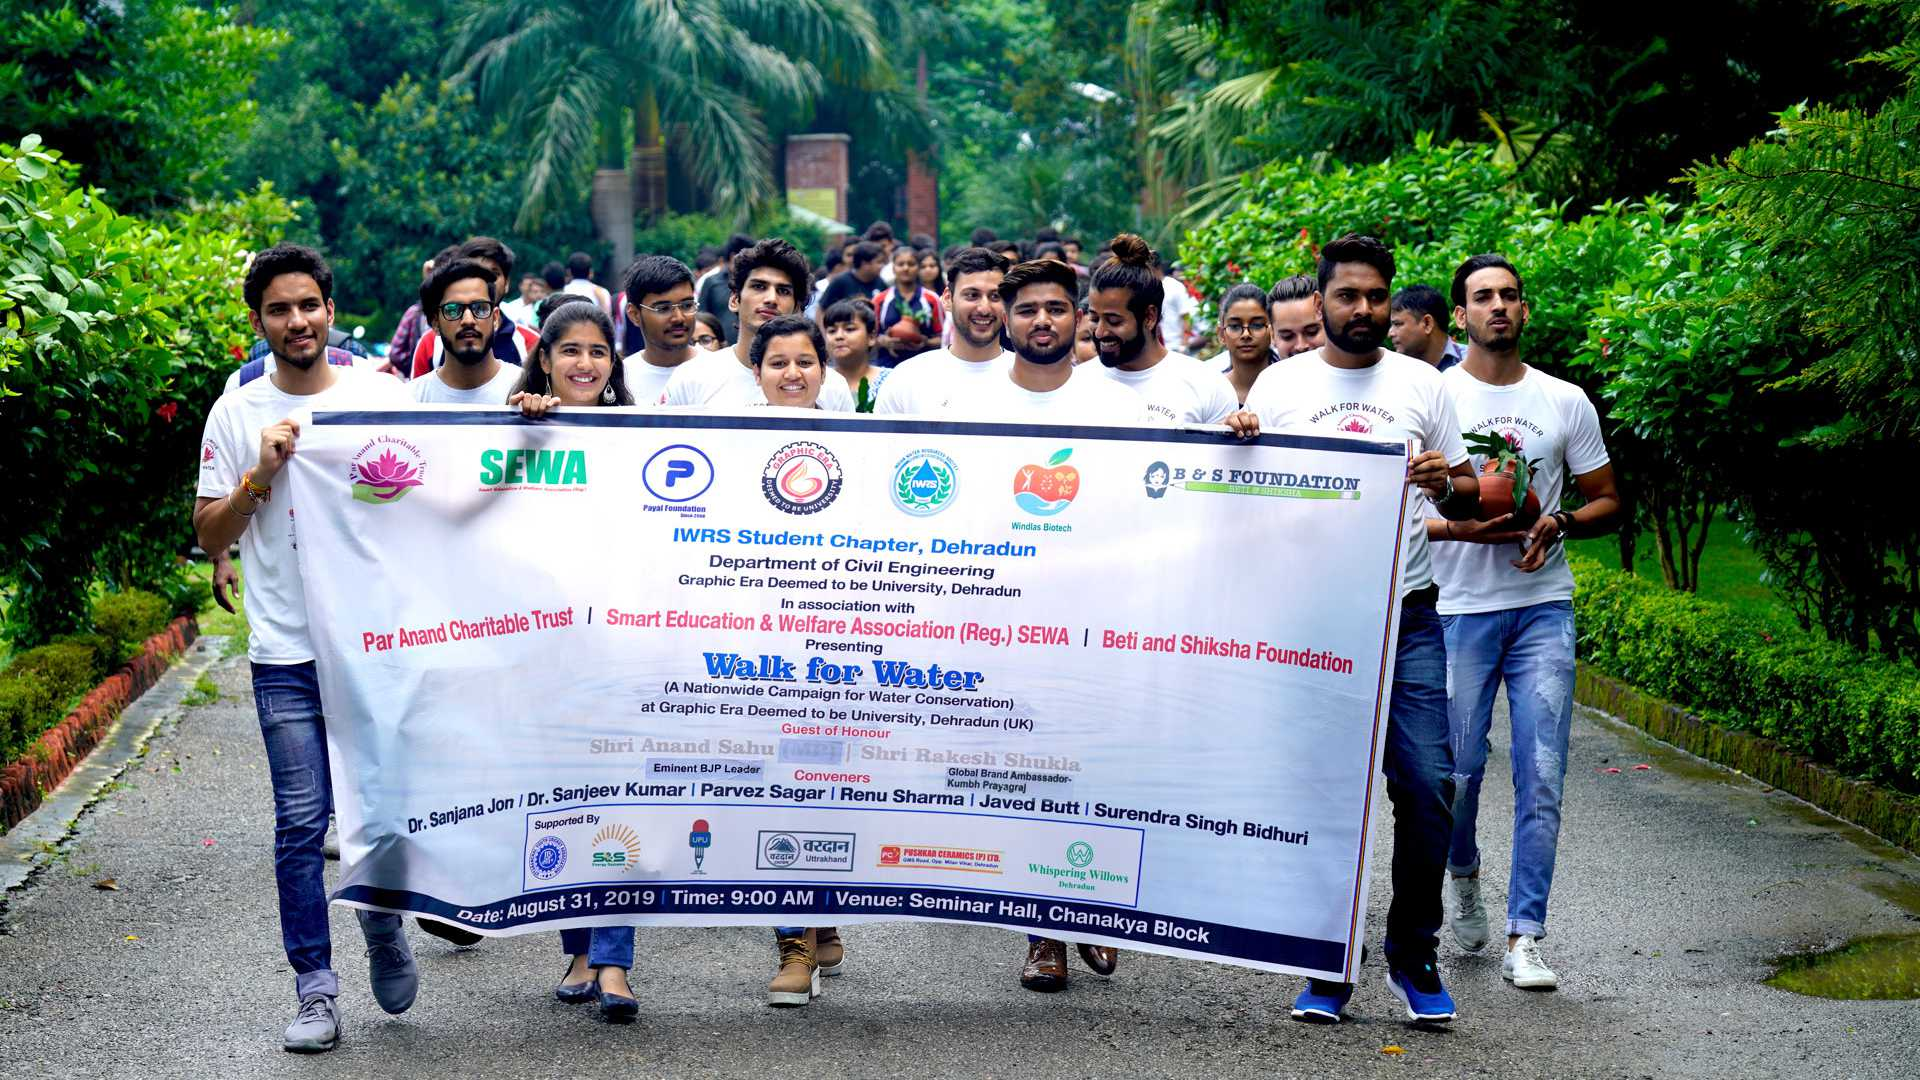 Walk for water inGraphic Era Deemed to be University Dehradun, Uttarakhand